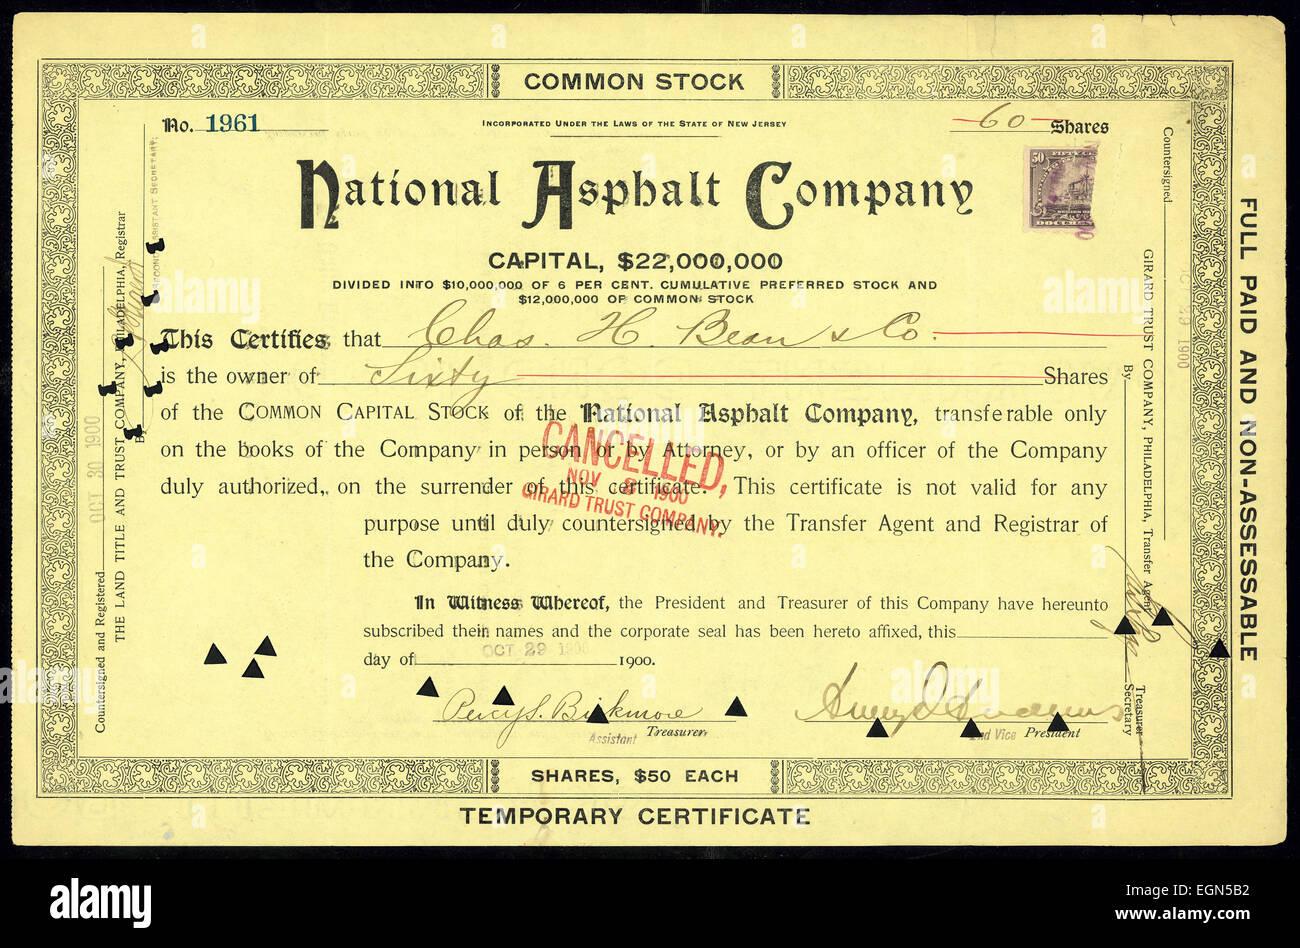 Common Capital Stock of National Asphalt Company - Stock Image